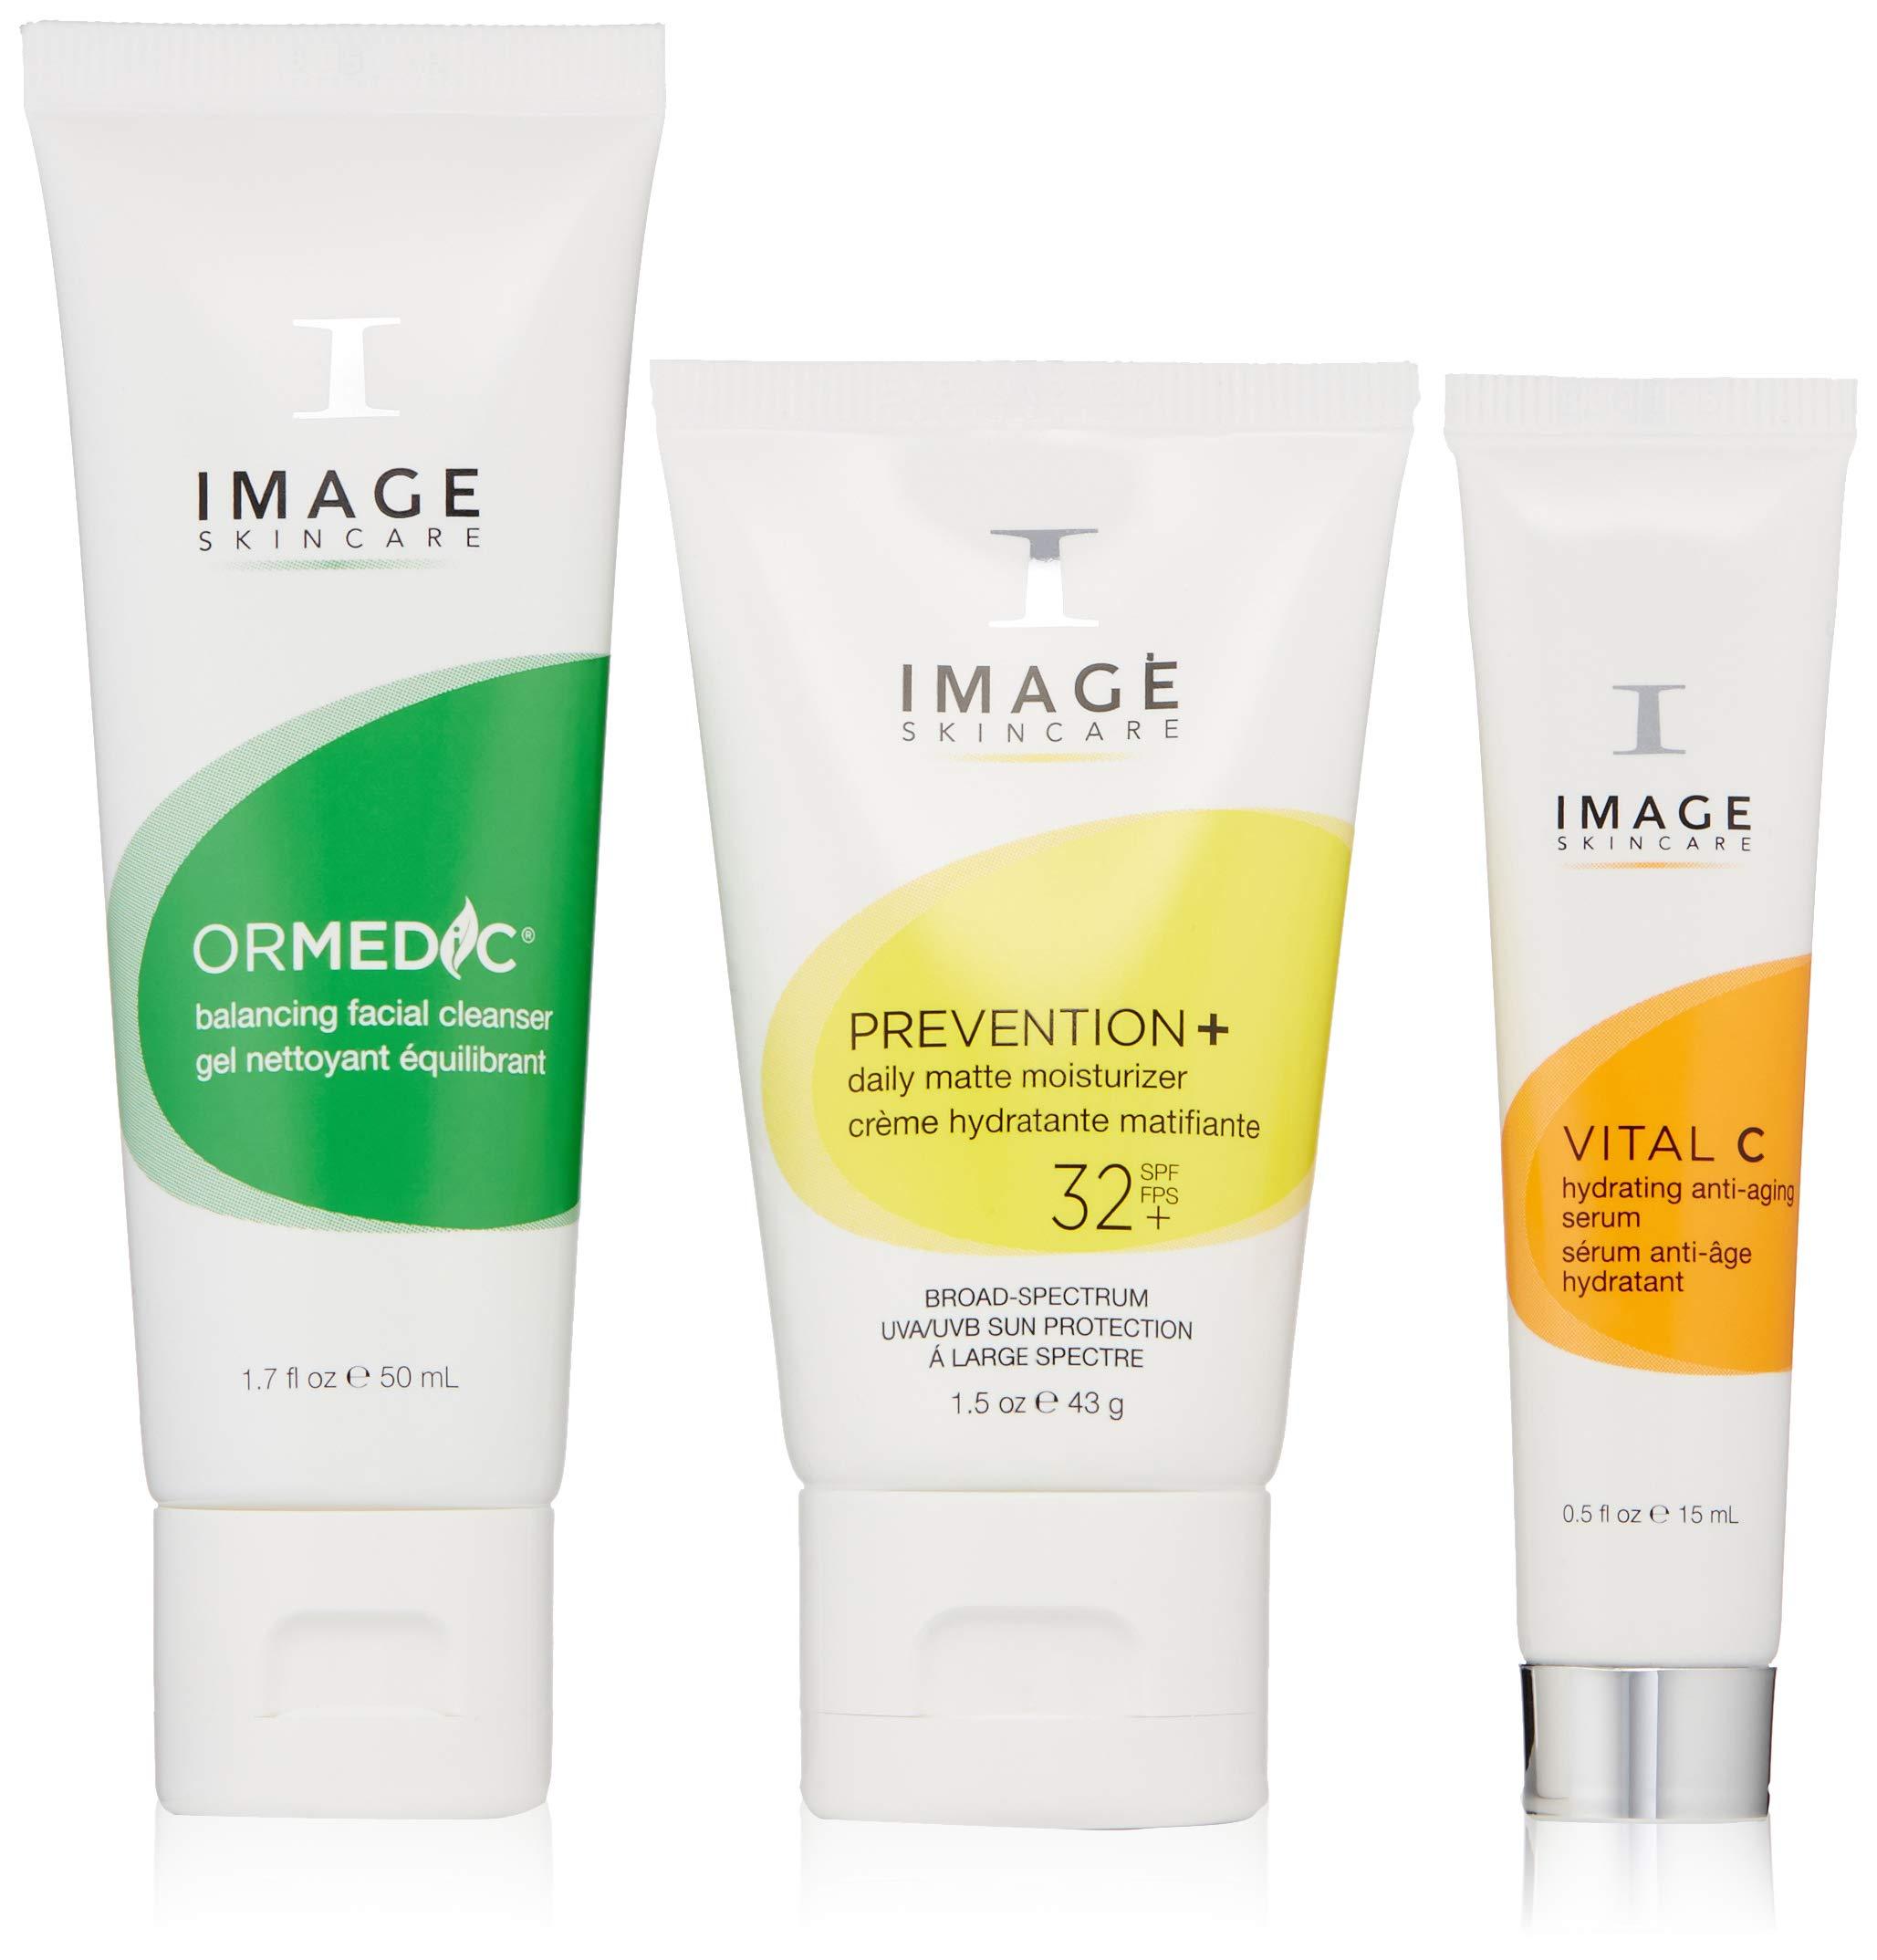 Image Skincare First Class Favorites Travel Set, 0.45 Lb